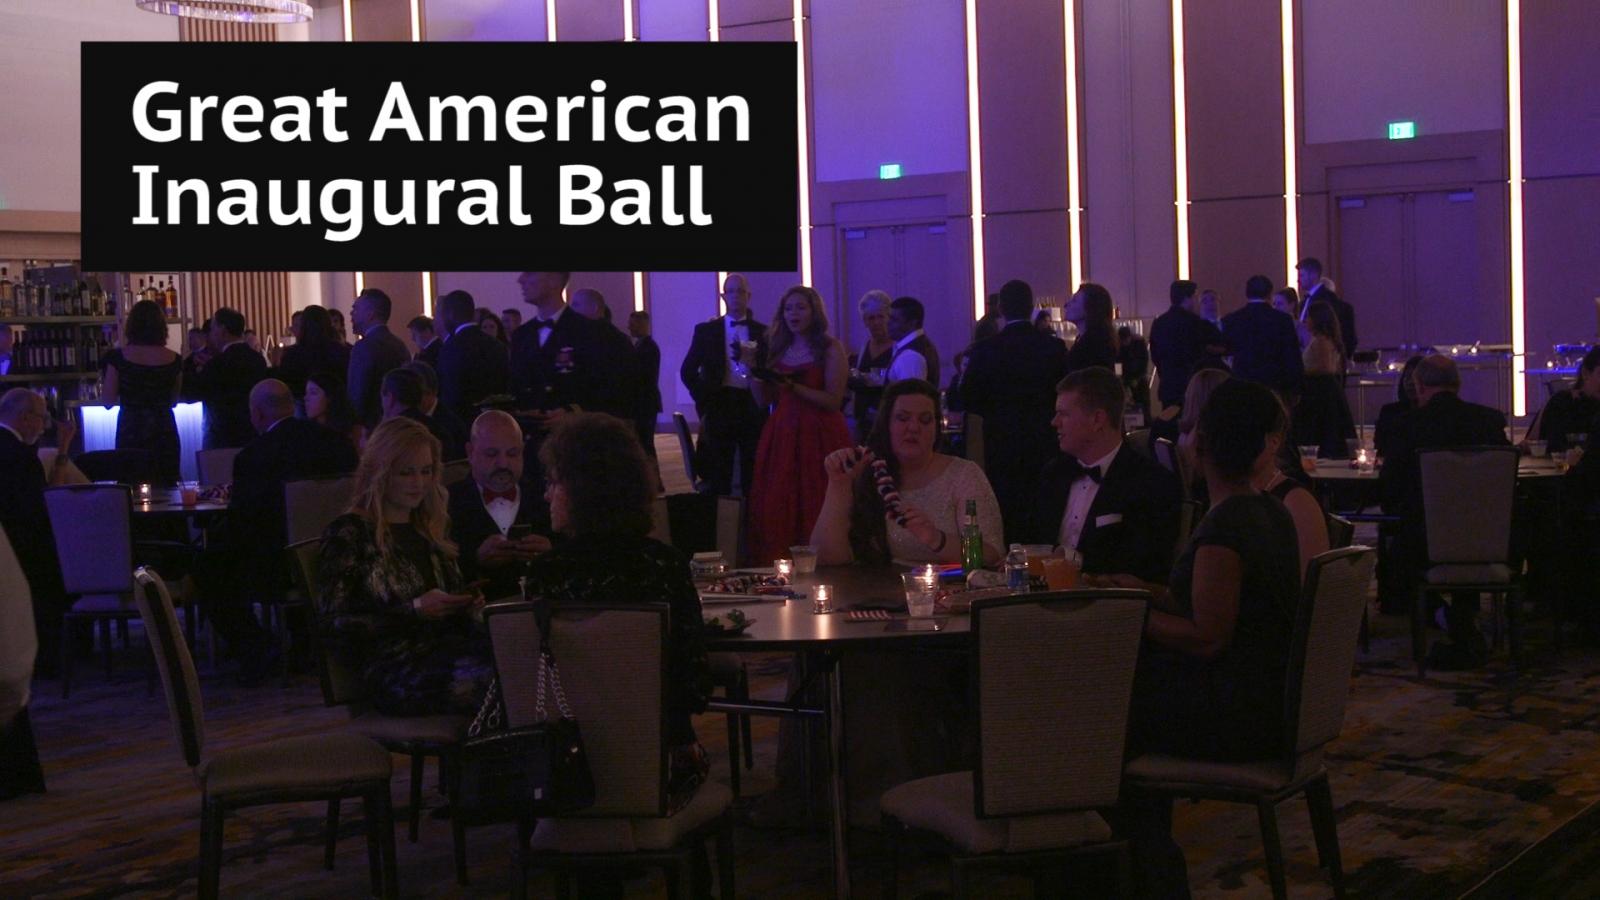 Great American Inaugural Ball: Donald Trump supporters celebrate in Washington DC